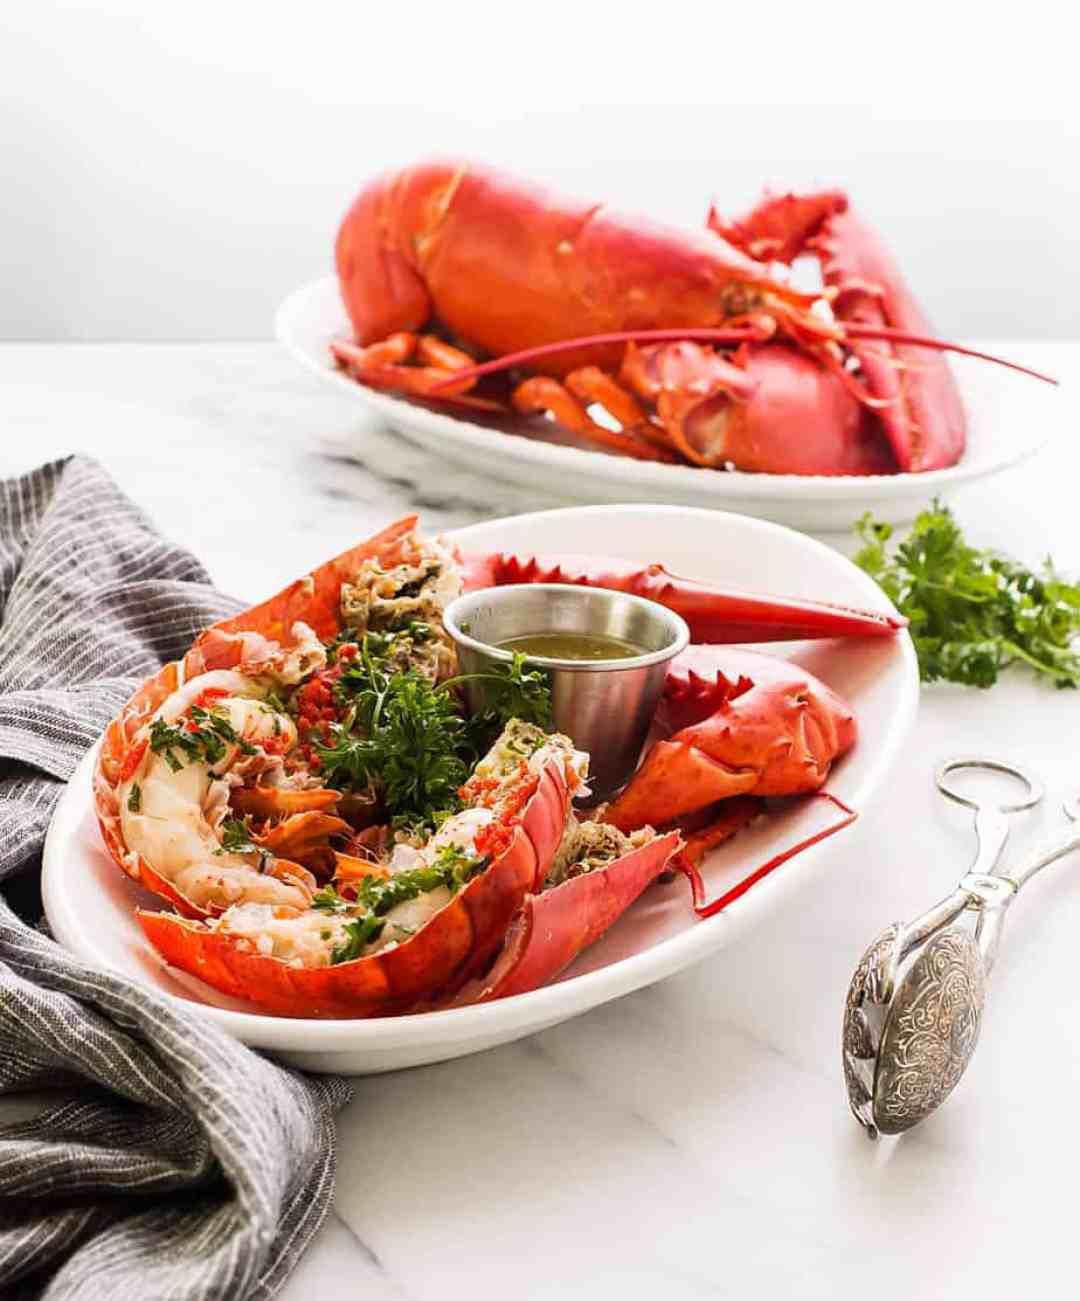 boiled lobster with garlic lemon butter dip sauce